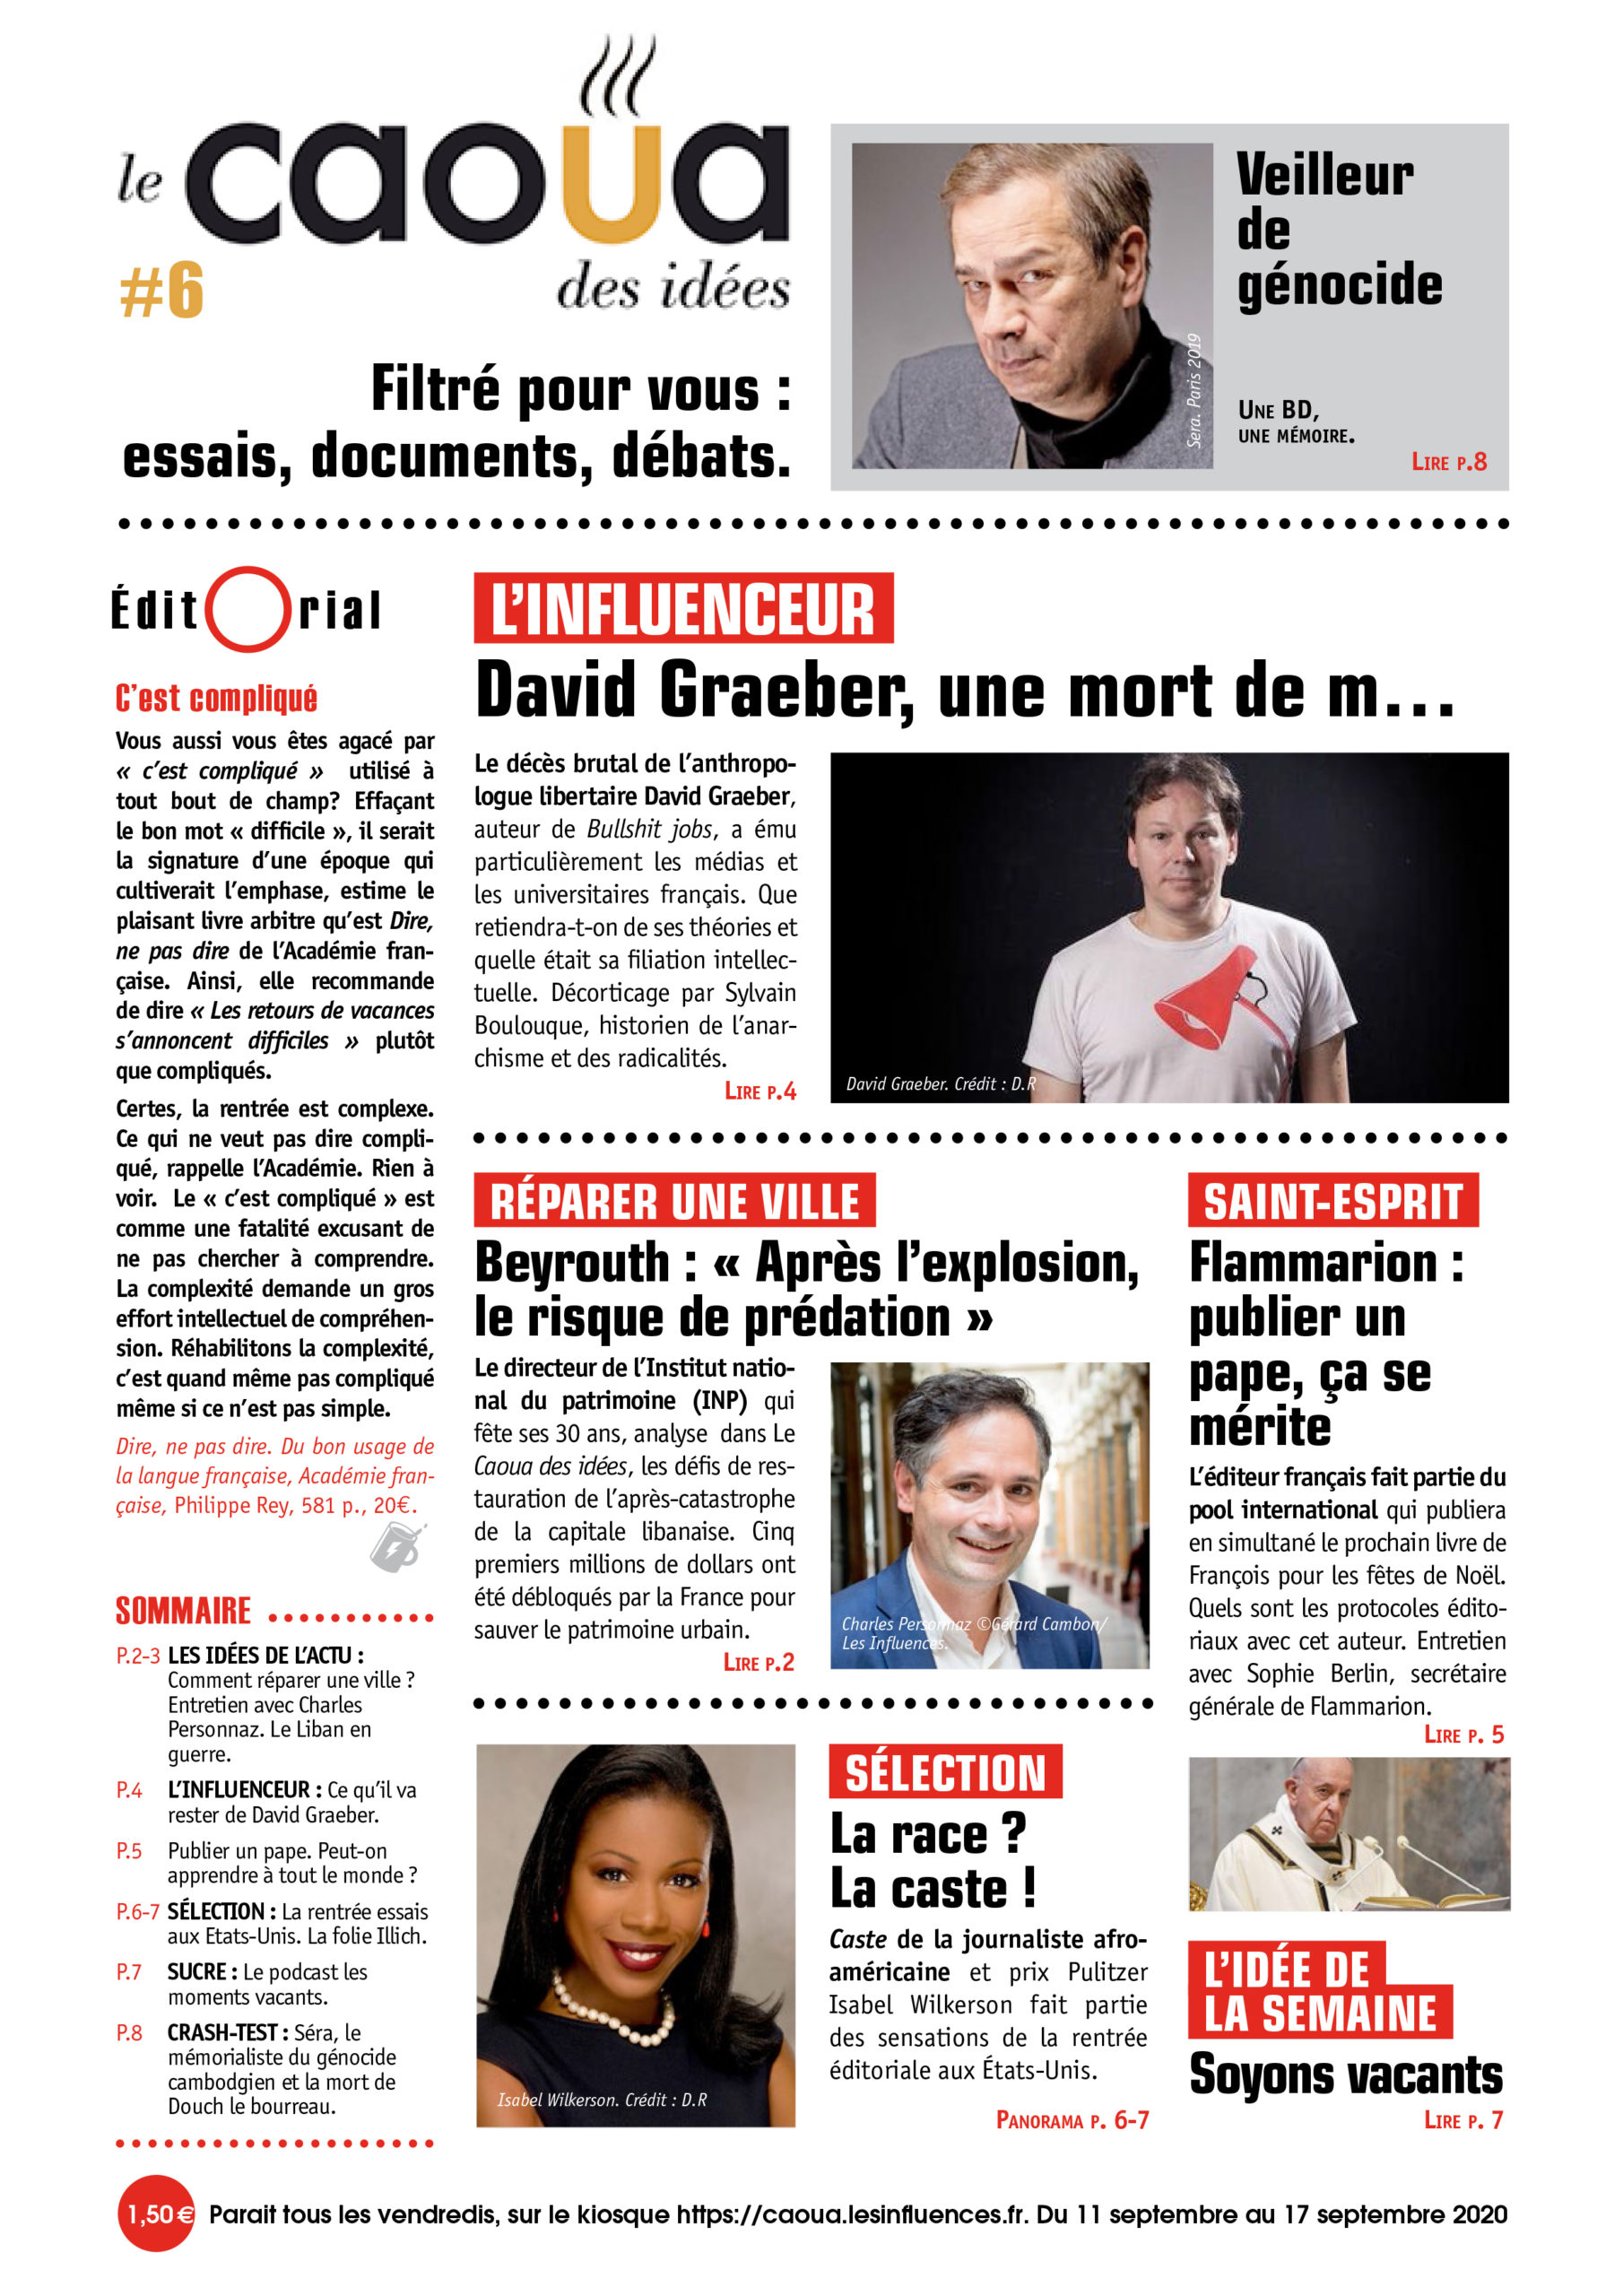 couv-newsletter_le_caoua_des_idees_n6.jpg